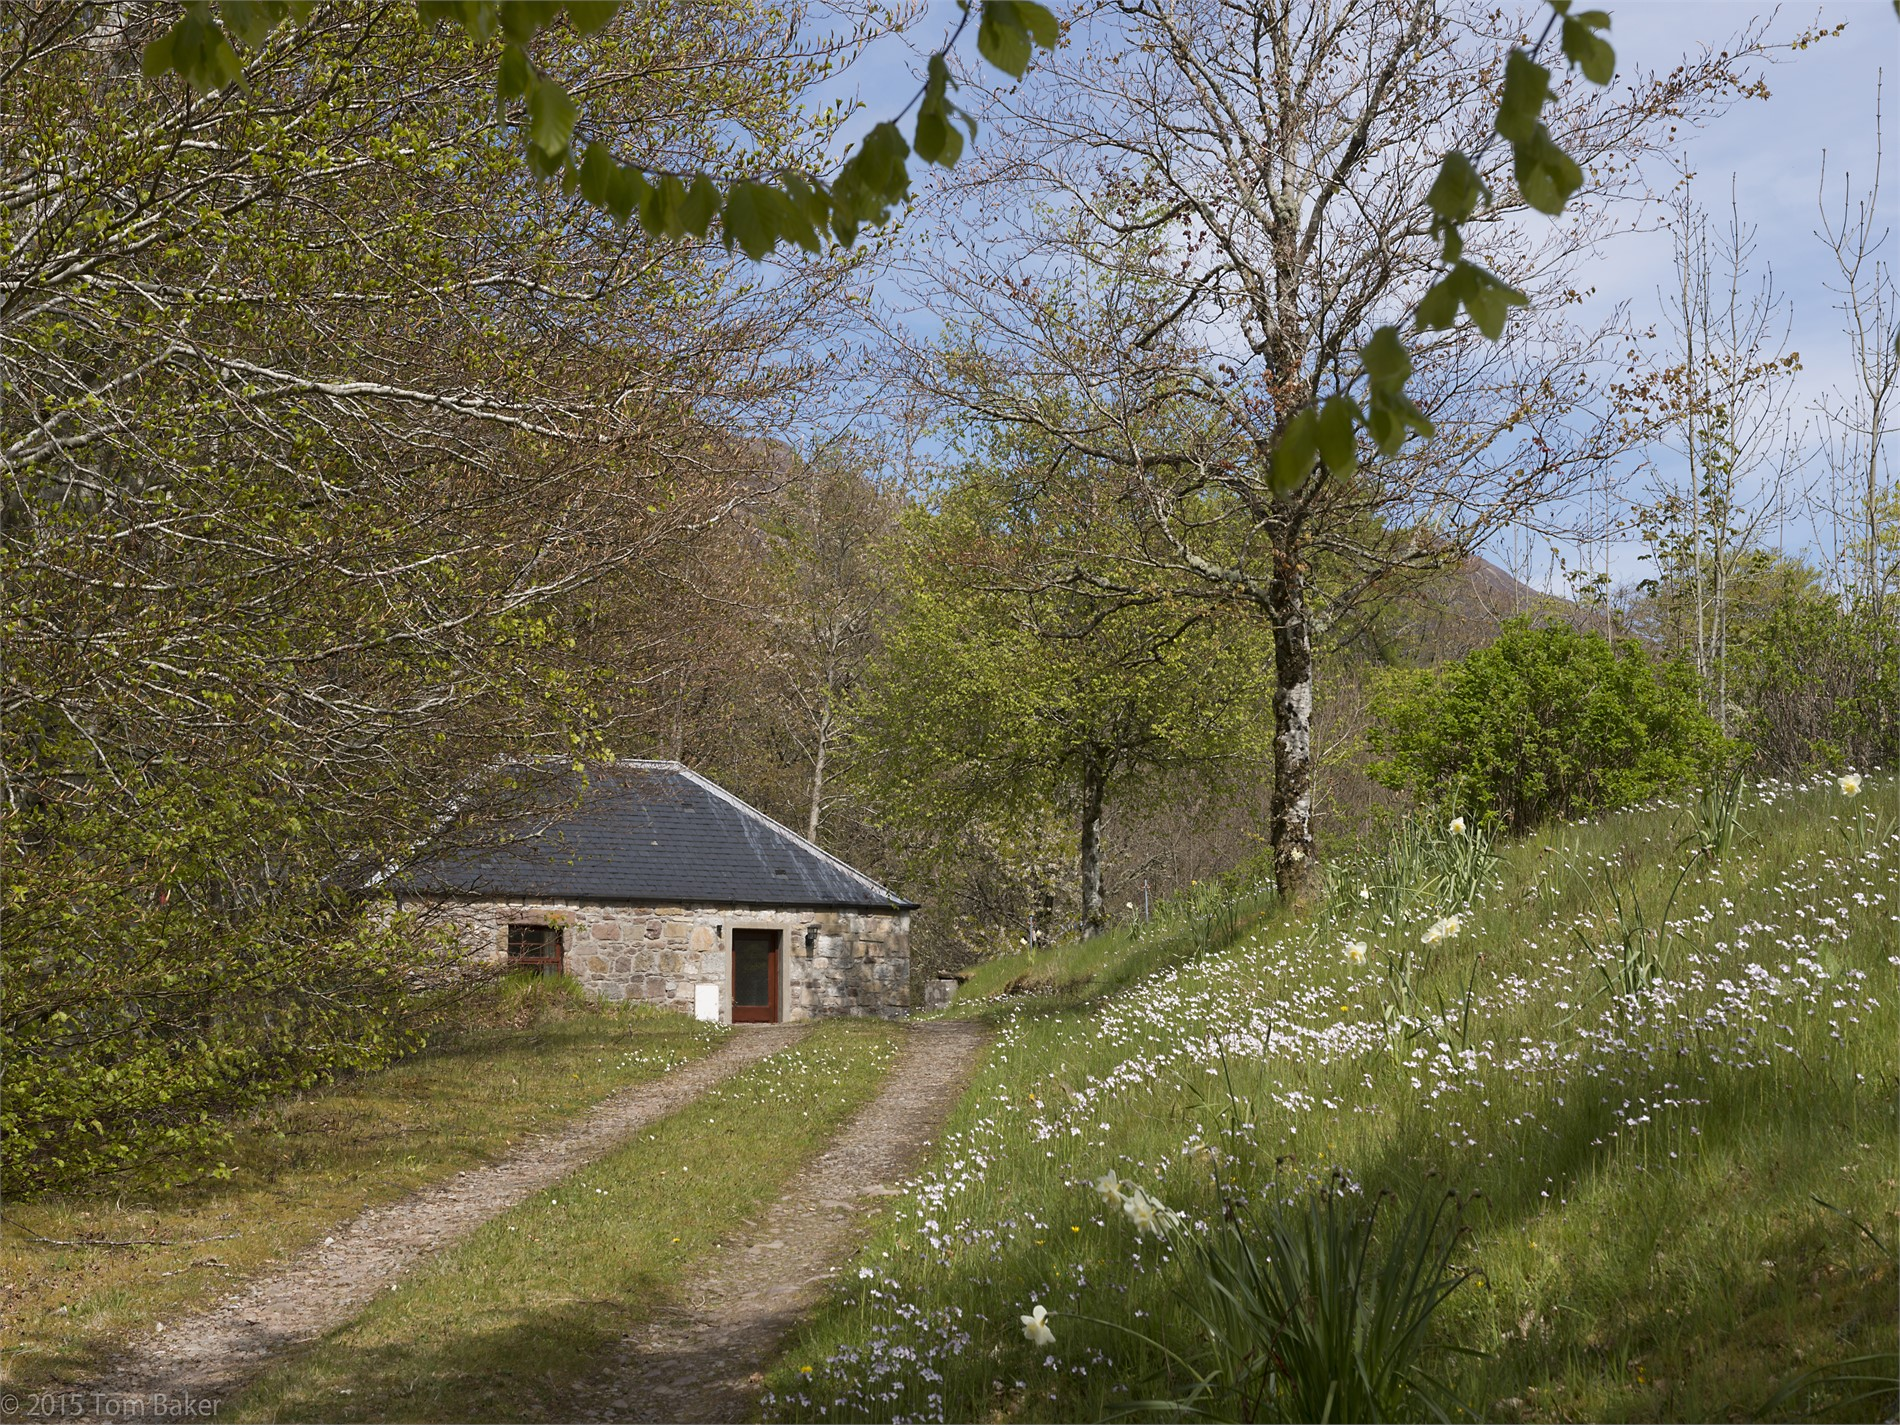 1 Bedroom Cottage in Applecross, Inverness, Loch Ness & Nairn, Highlands